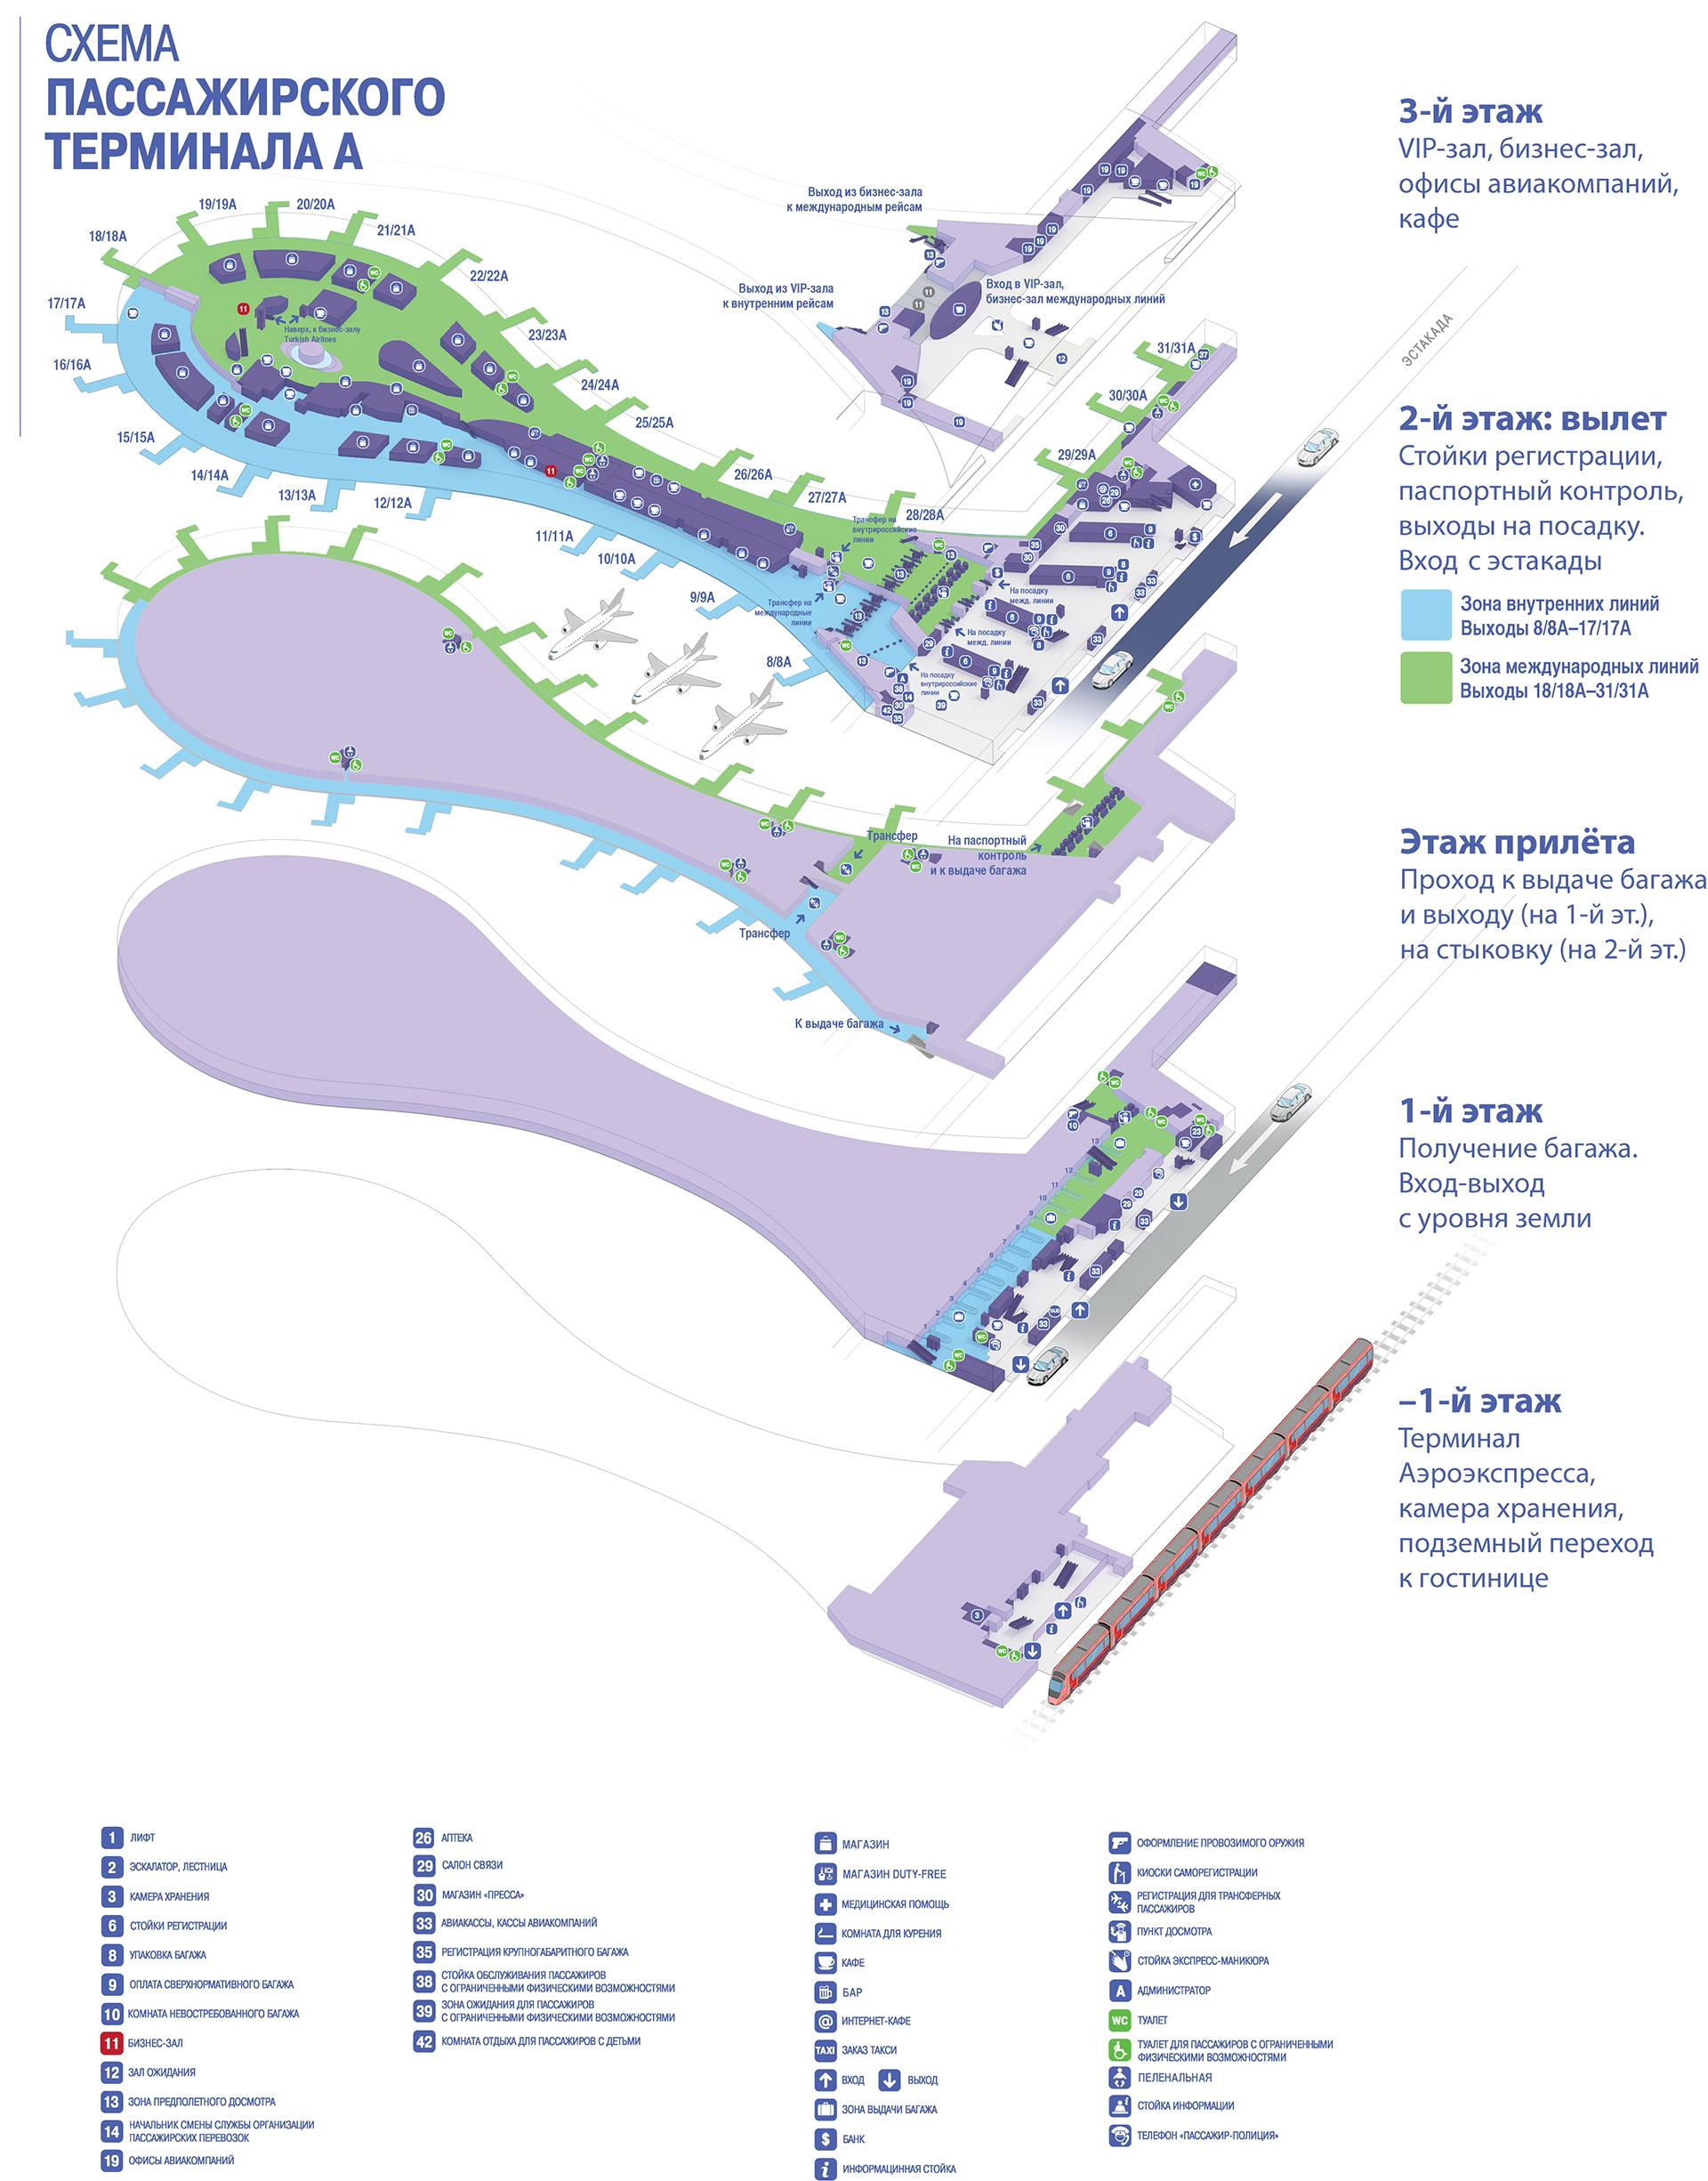 Схема терминала А аэропорта Внуково